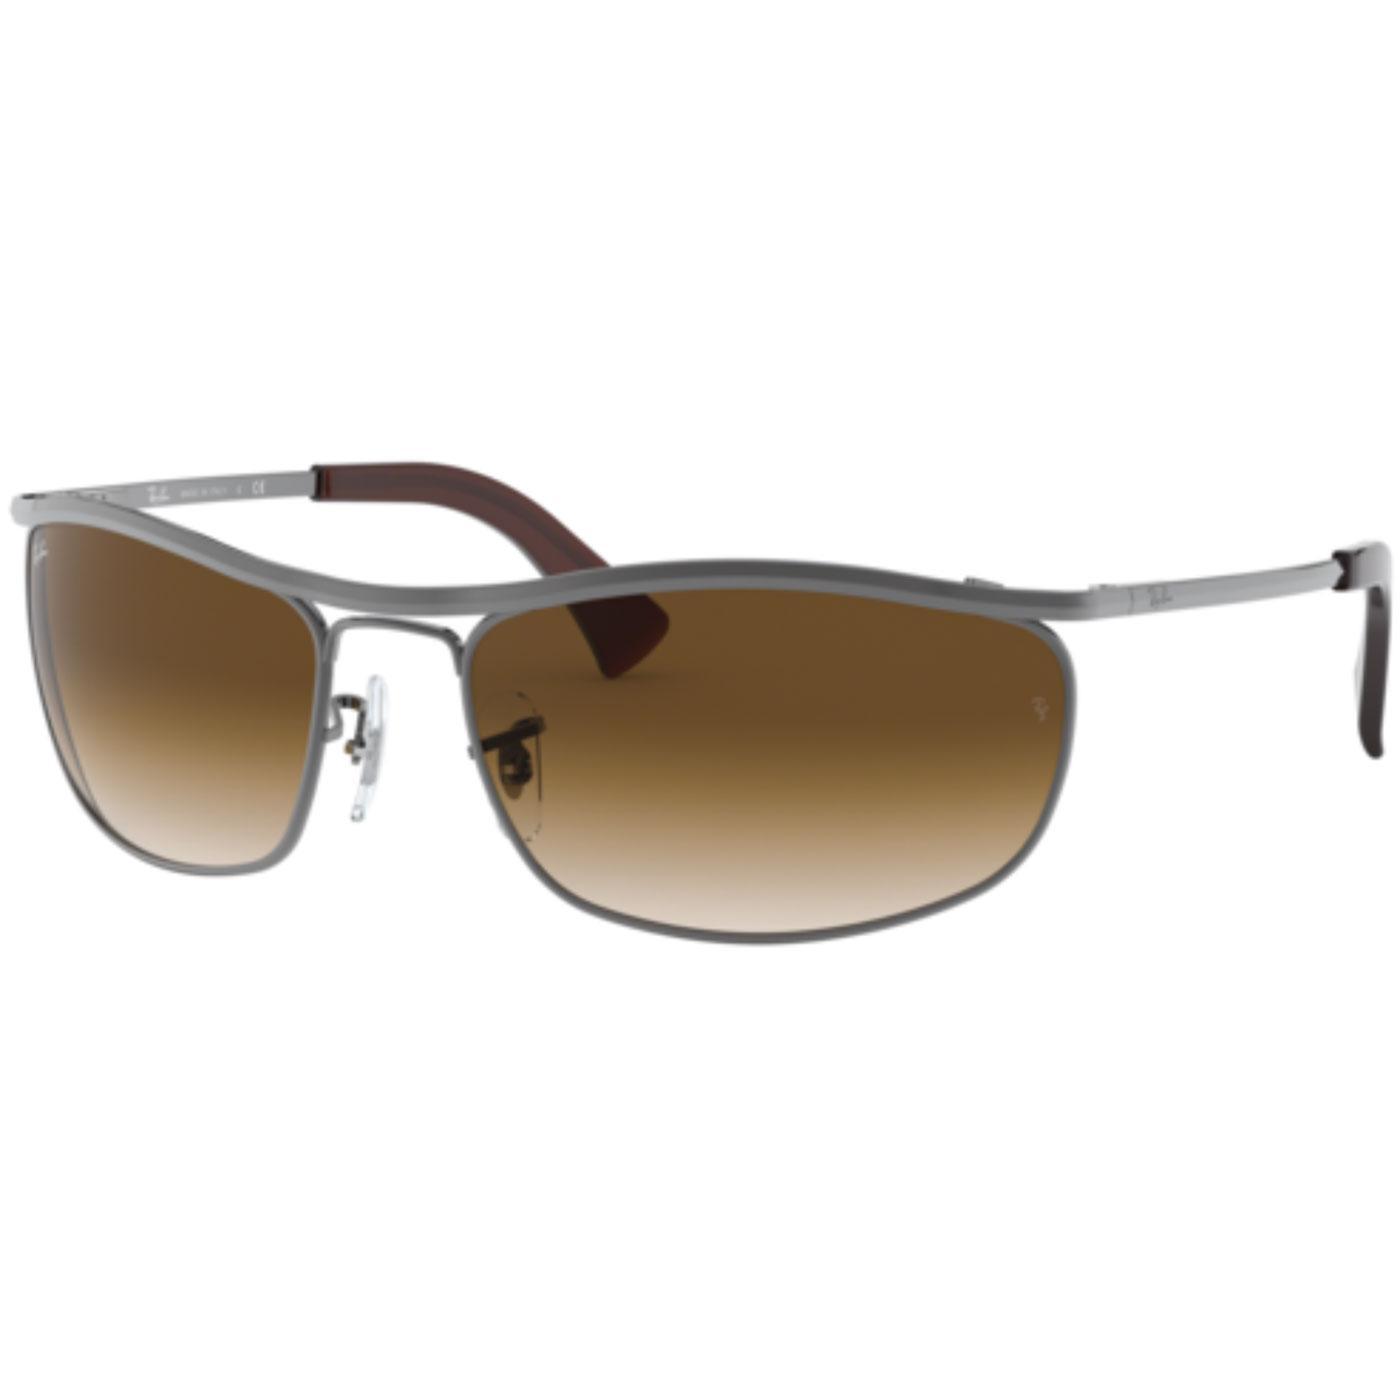 Olympian Ray-Ban Retro 70s Mod Icons Sunglasses B